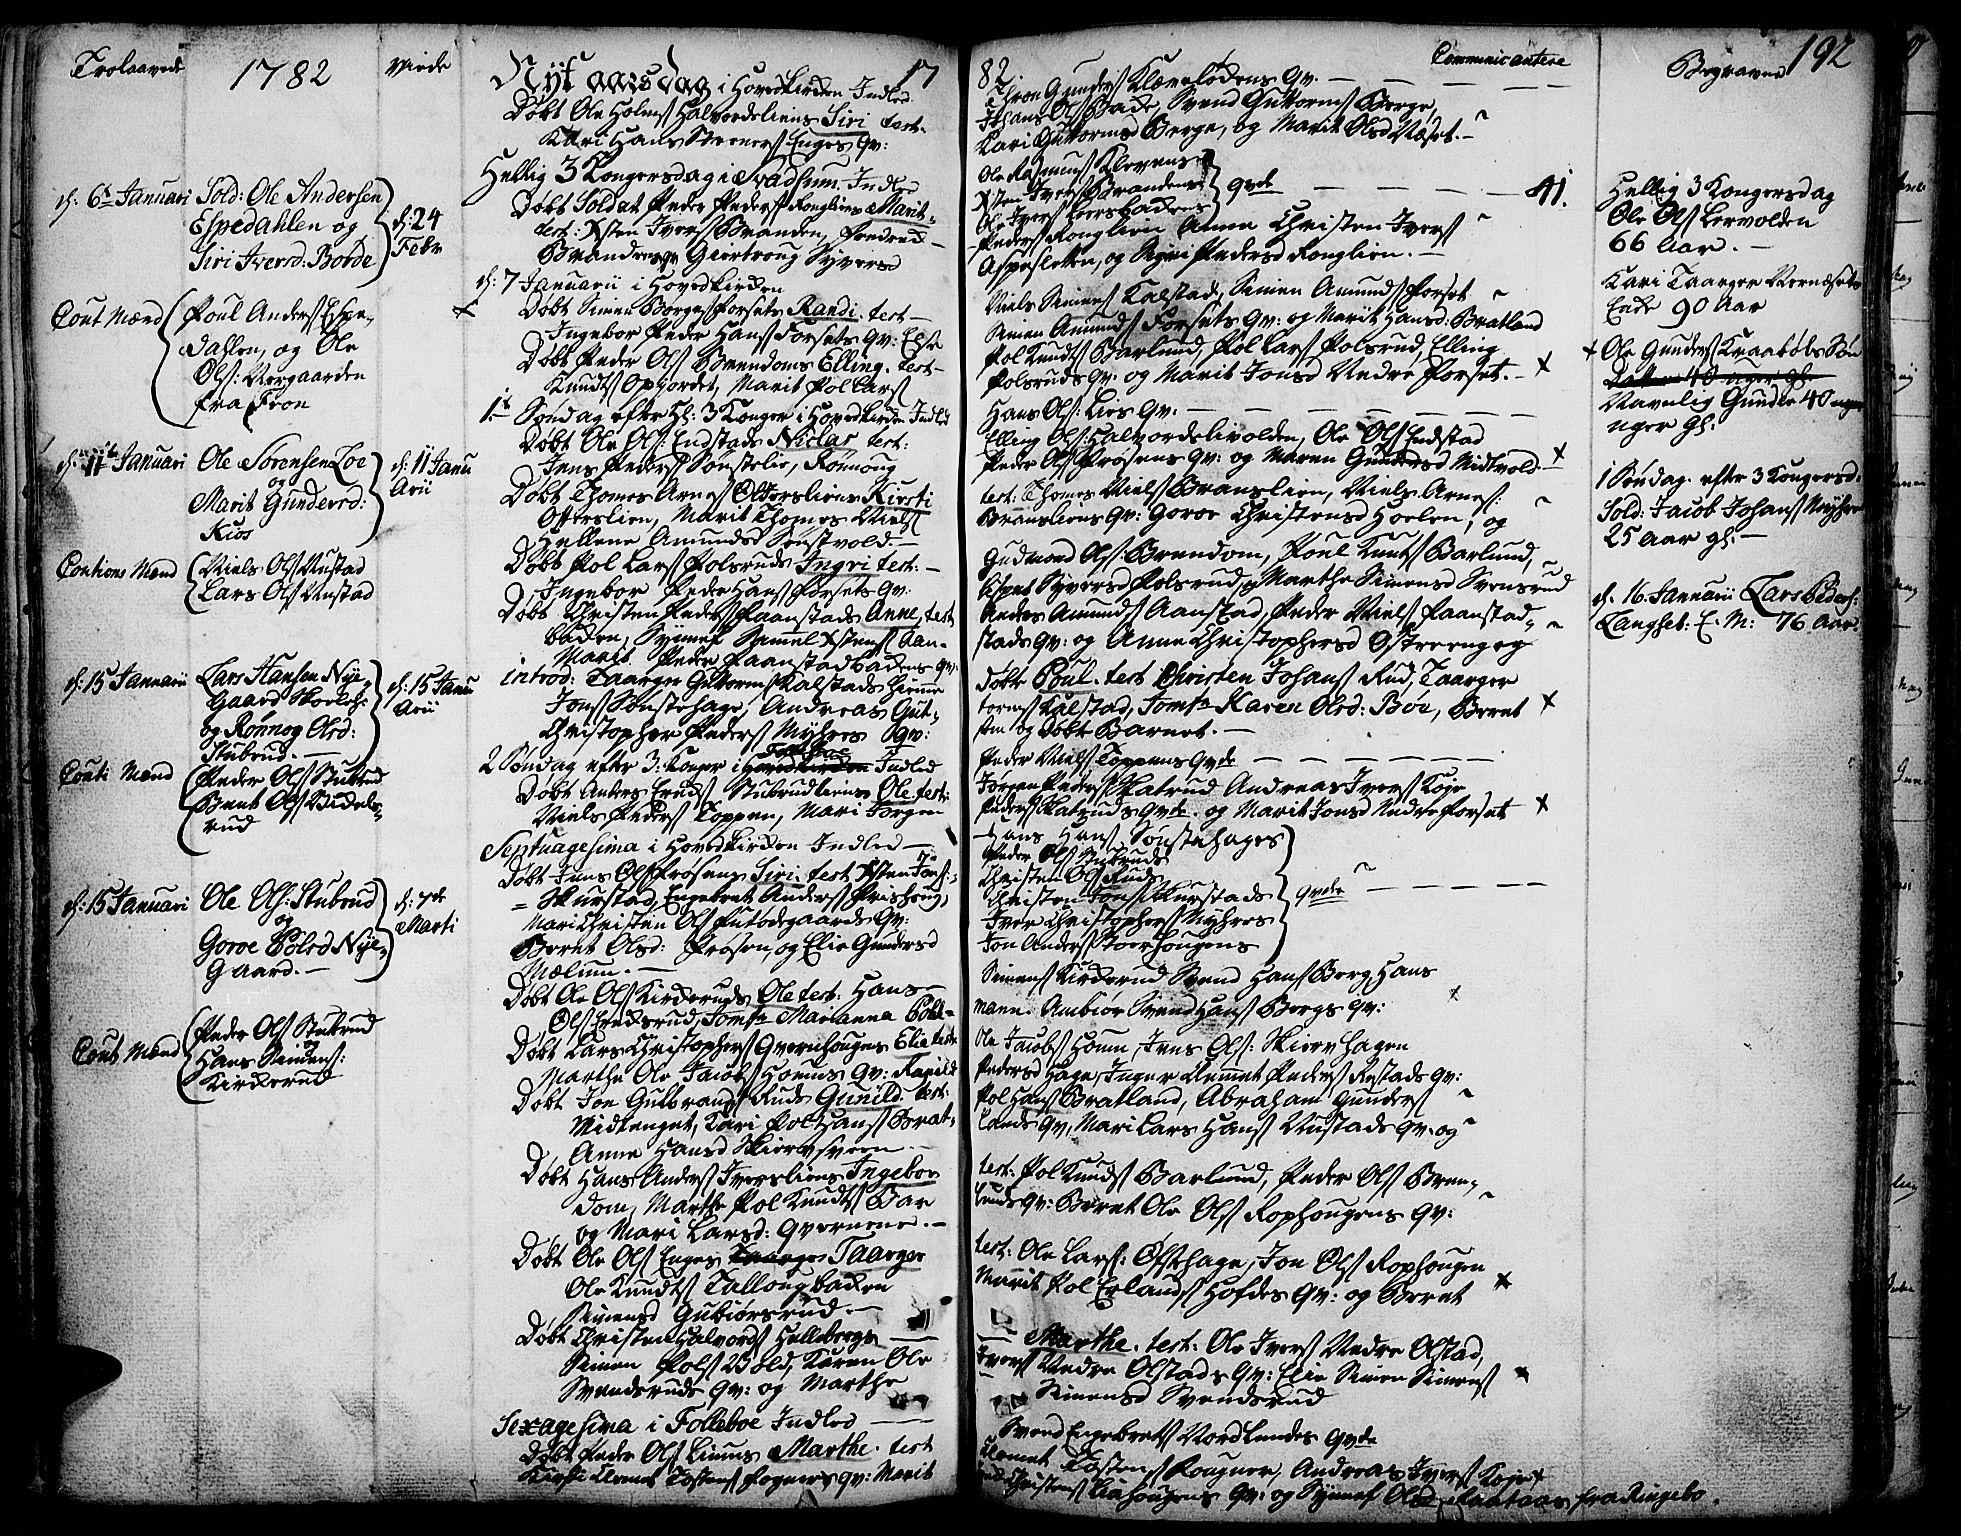 SAH, Gausdal prestekontor, Ministerialbok nr. 3, 1758-1809, s. 192